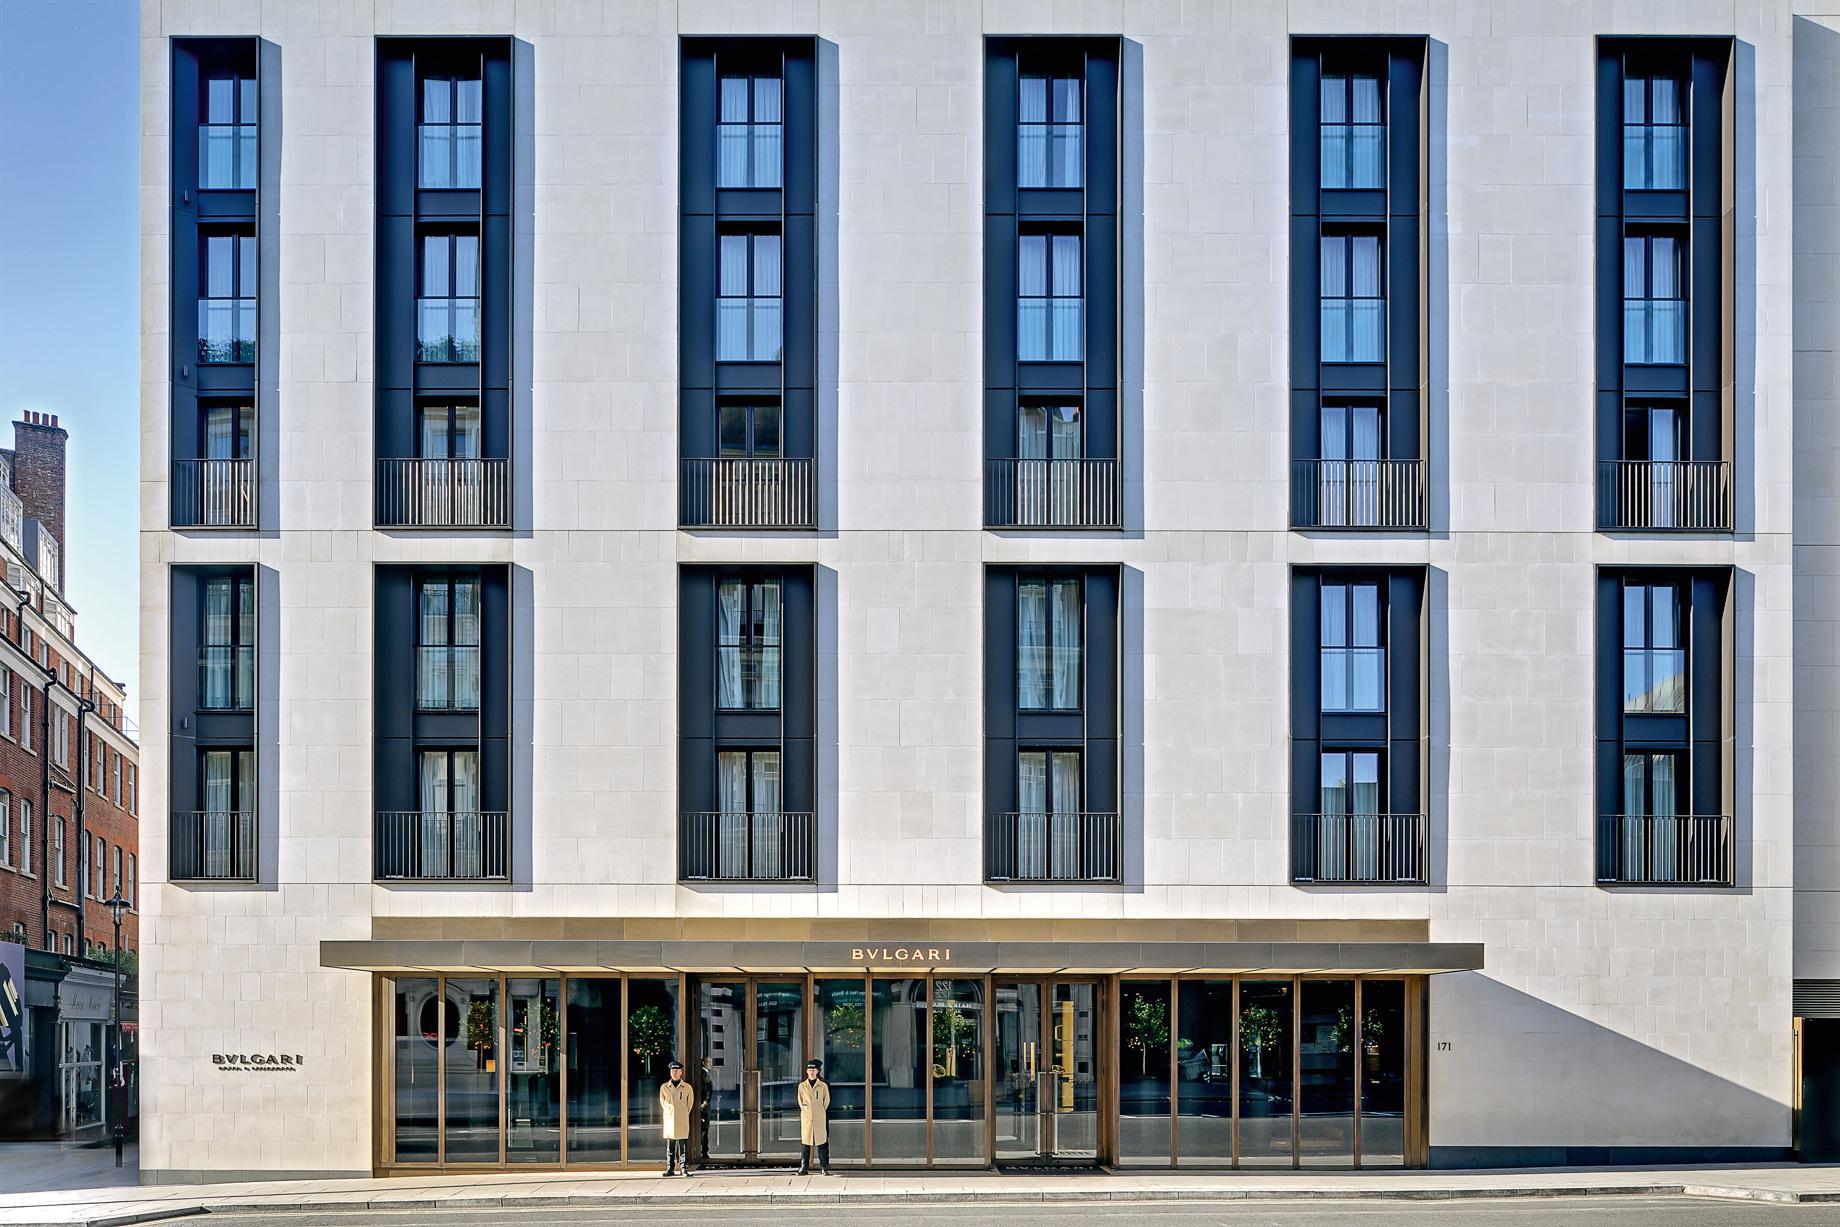 Bvlgari Luxury Hotel London - Knightsbridge, London, UK - Hotel Front Facade